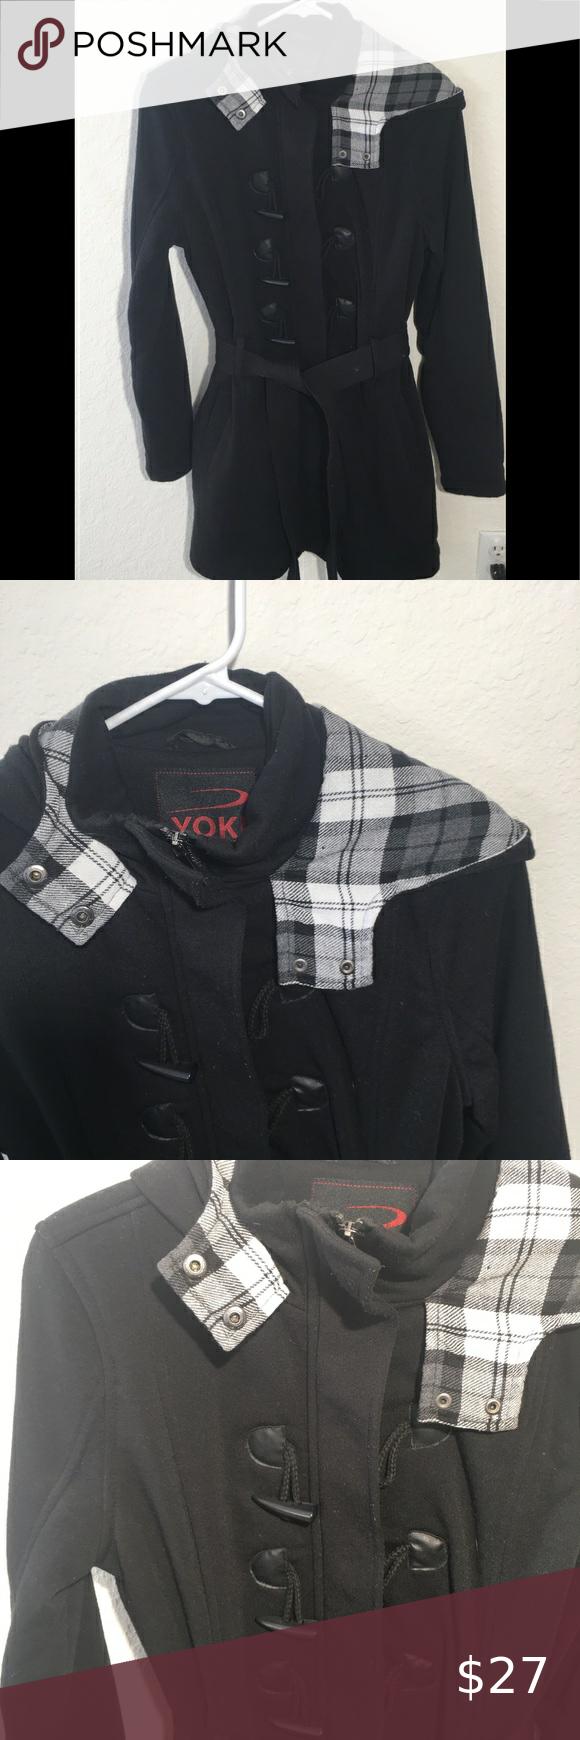 Yoki Outerwear Collection Jacket Pea Coat Hoodie Hoodie Coat Outerwear Women Clothes Design [ 1740 x 580 Pixel ]